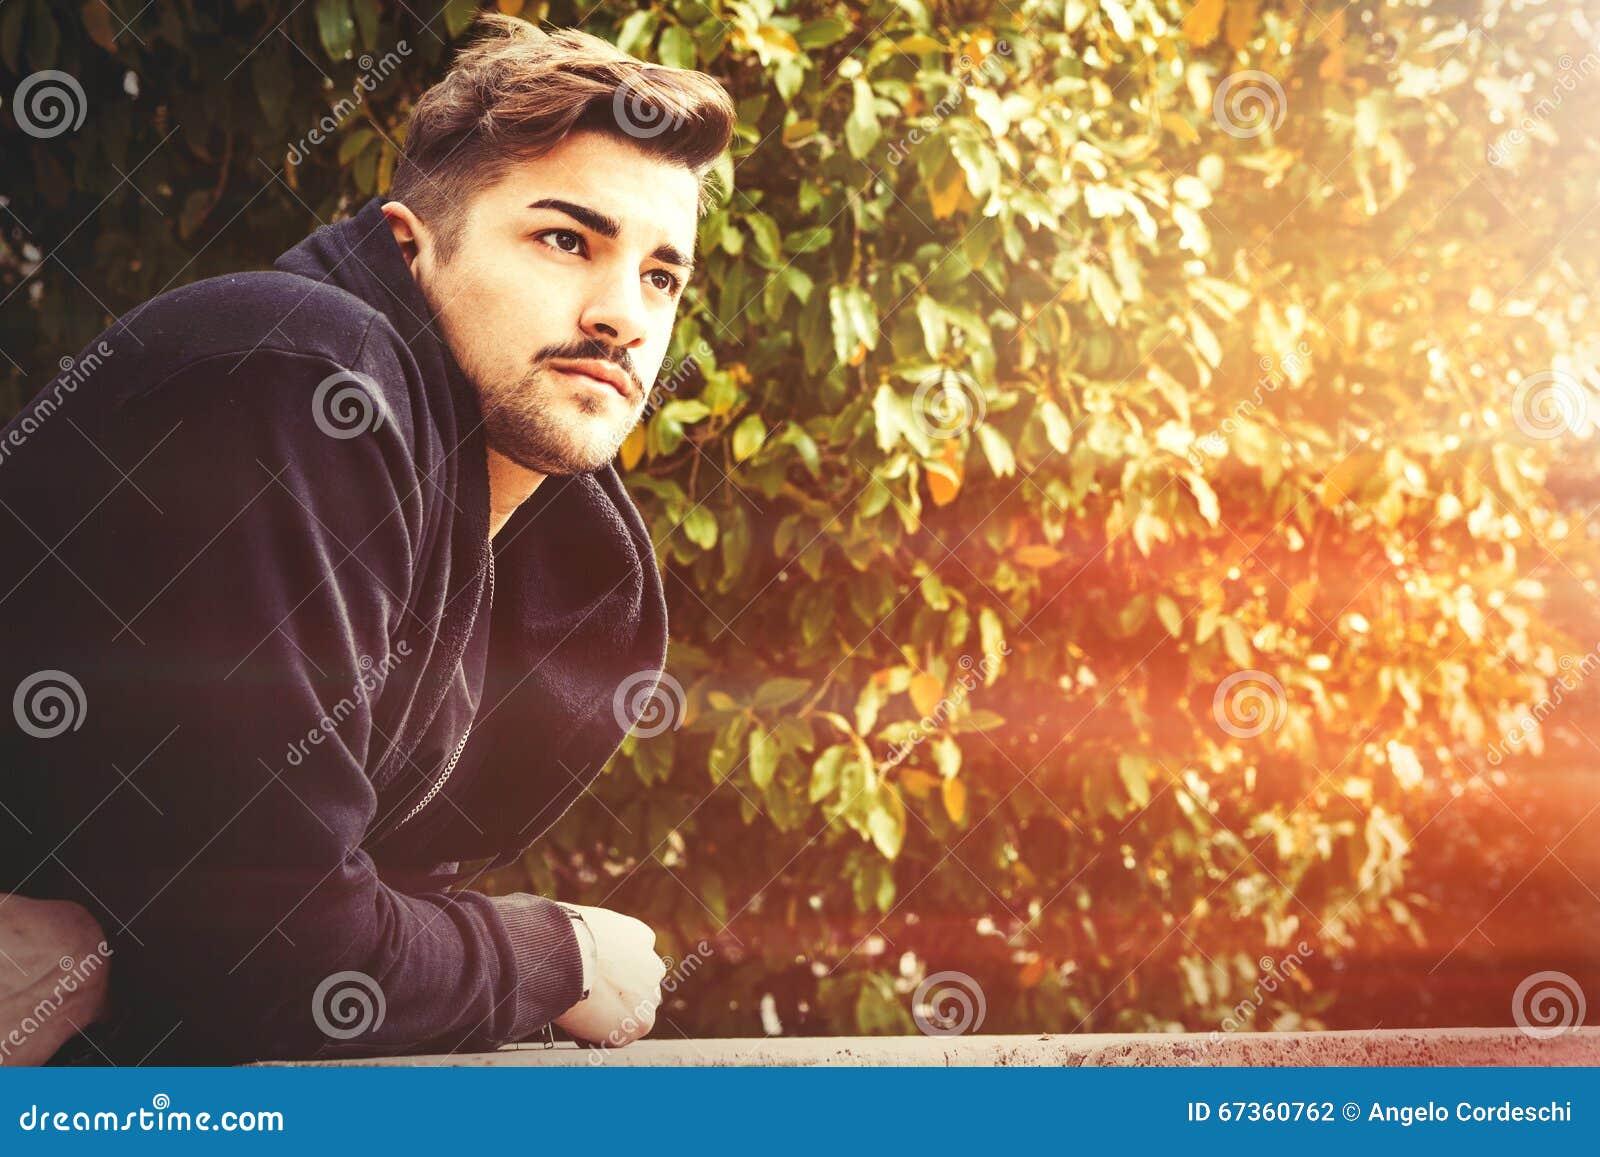 Homem italiano da harmonia nova considerável - espera romântica